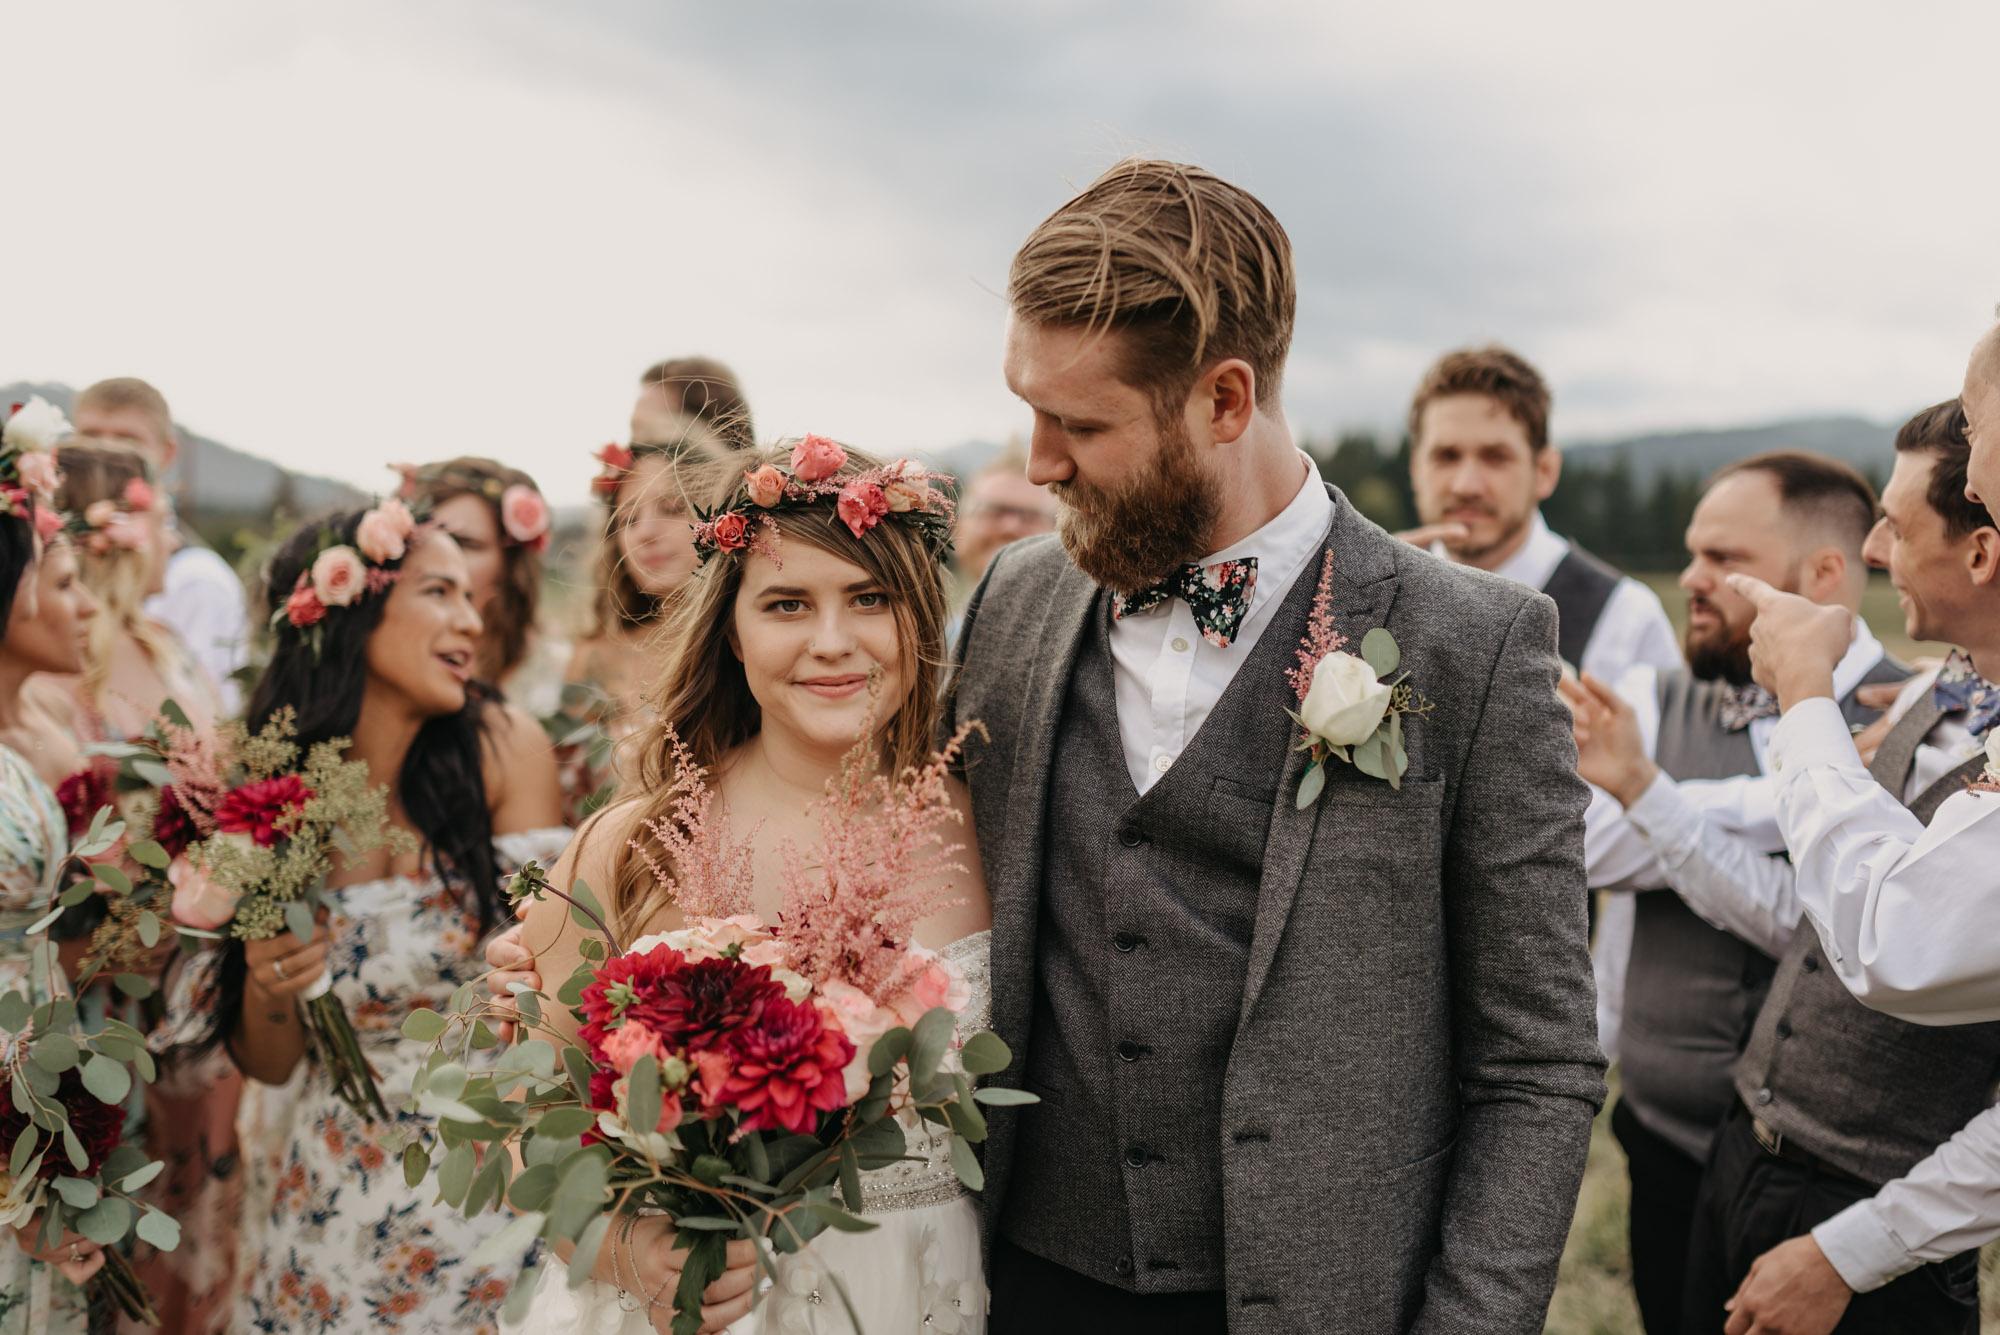 Bridal-Party-Free-People-Flower-Dresses-Washington-Wedding-8682.jpg